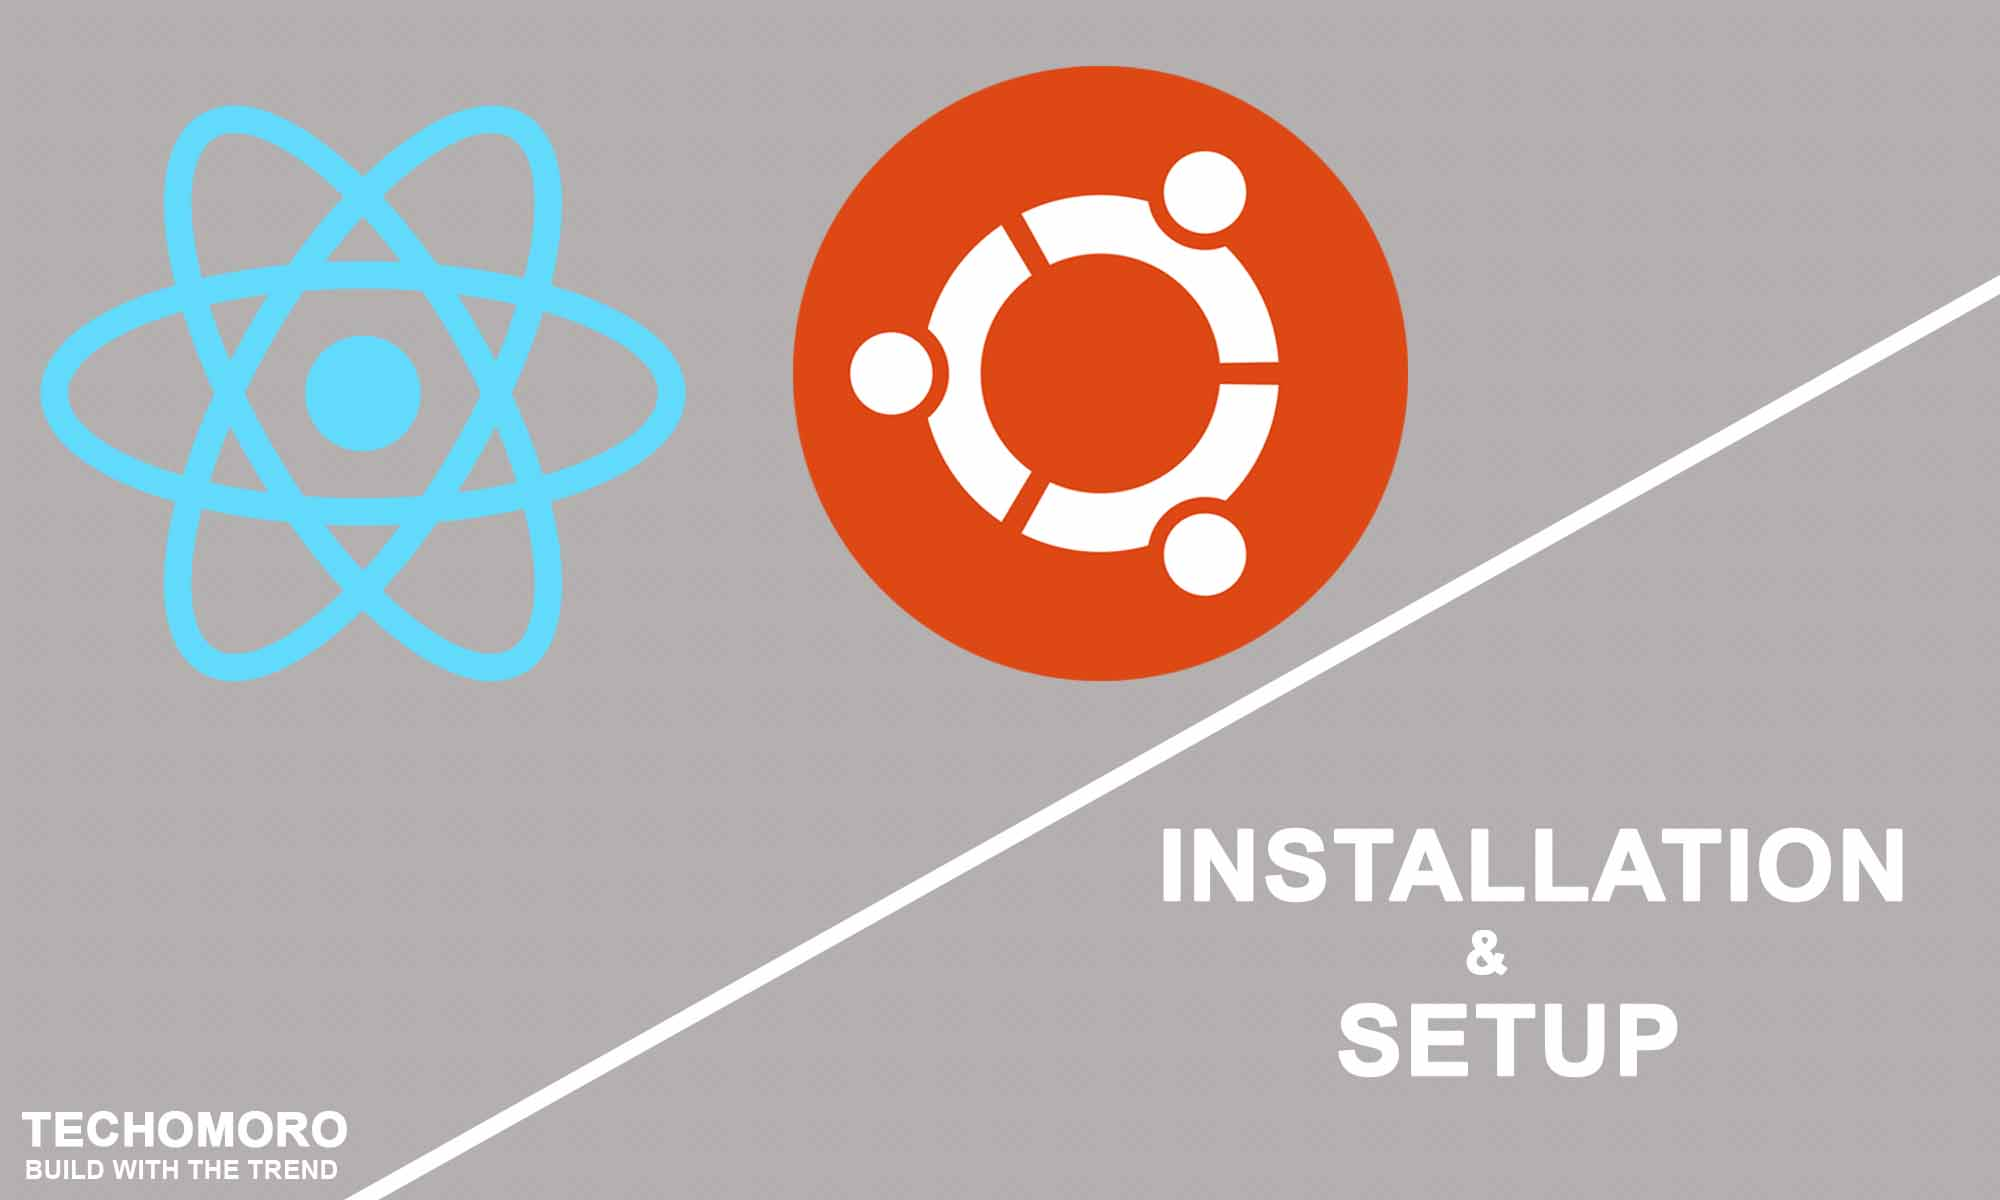 How to Install and Setup React Native on Ubuntu 18 04 1 LTS (Bionic